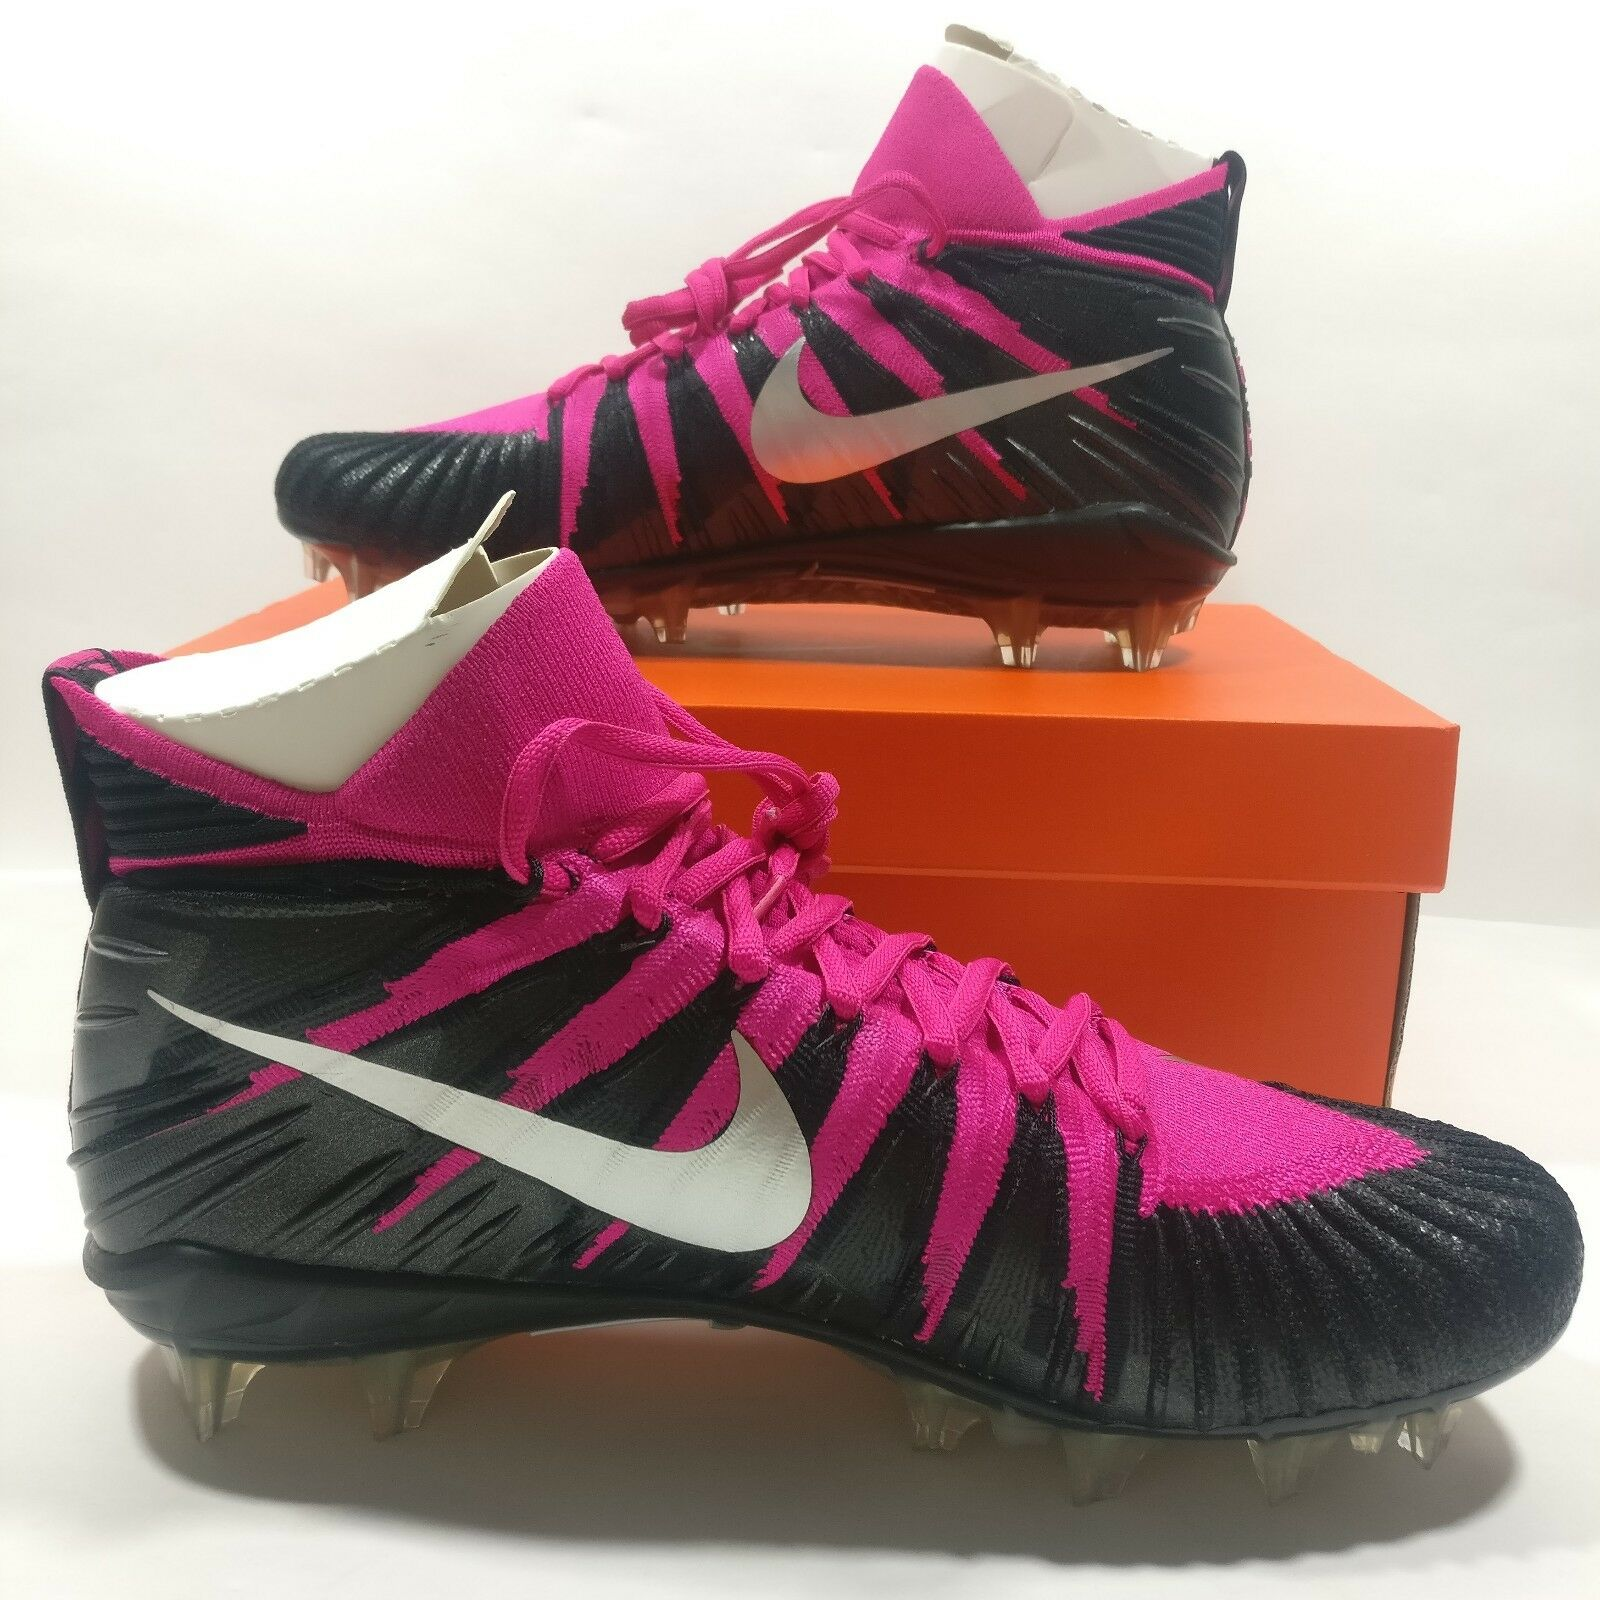 Nike alfa minaccia elite bca, il football cancro al seno 918203-006 football il scarpe taglia 10,5 83fb02